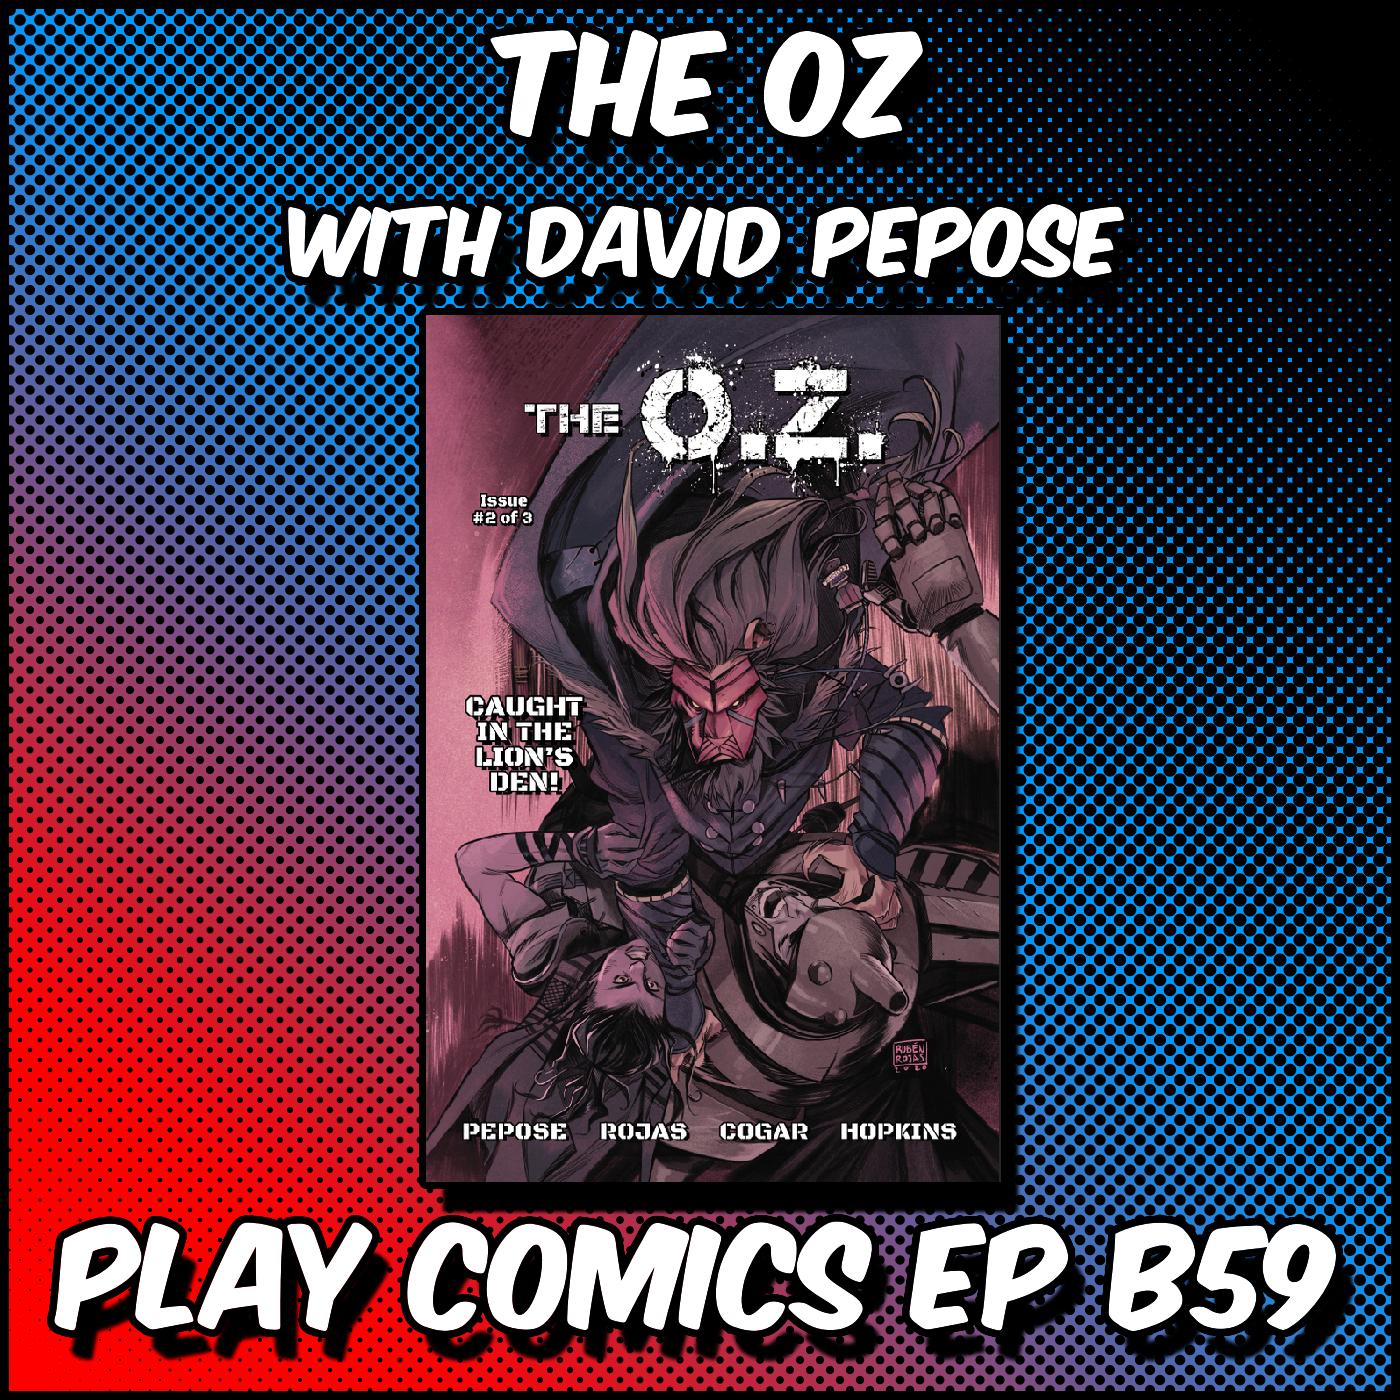 The OZ With David Pepose